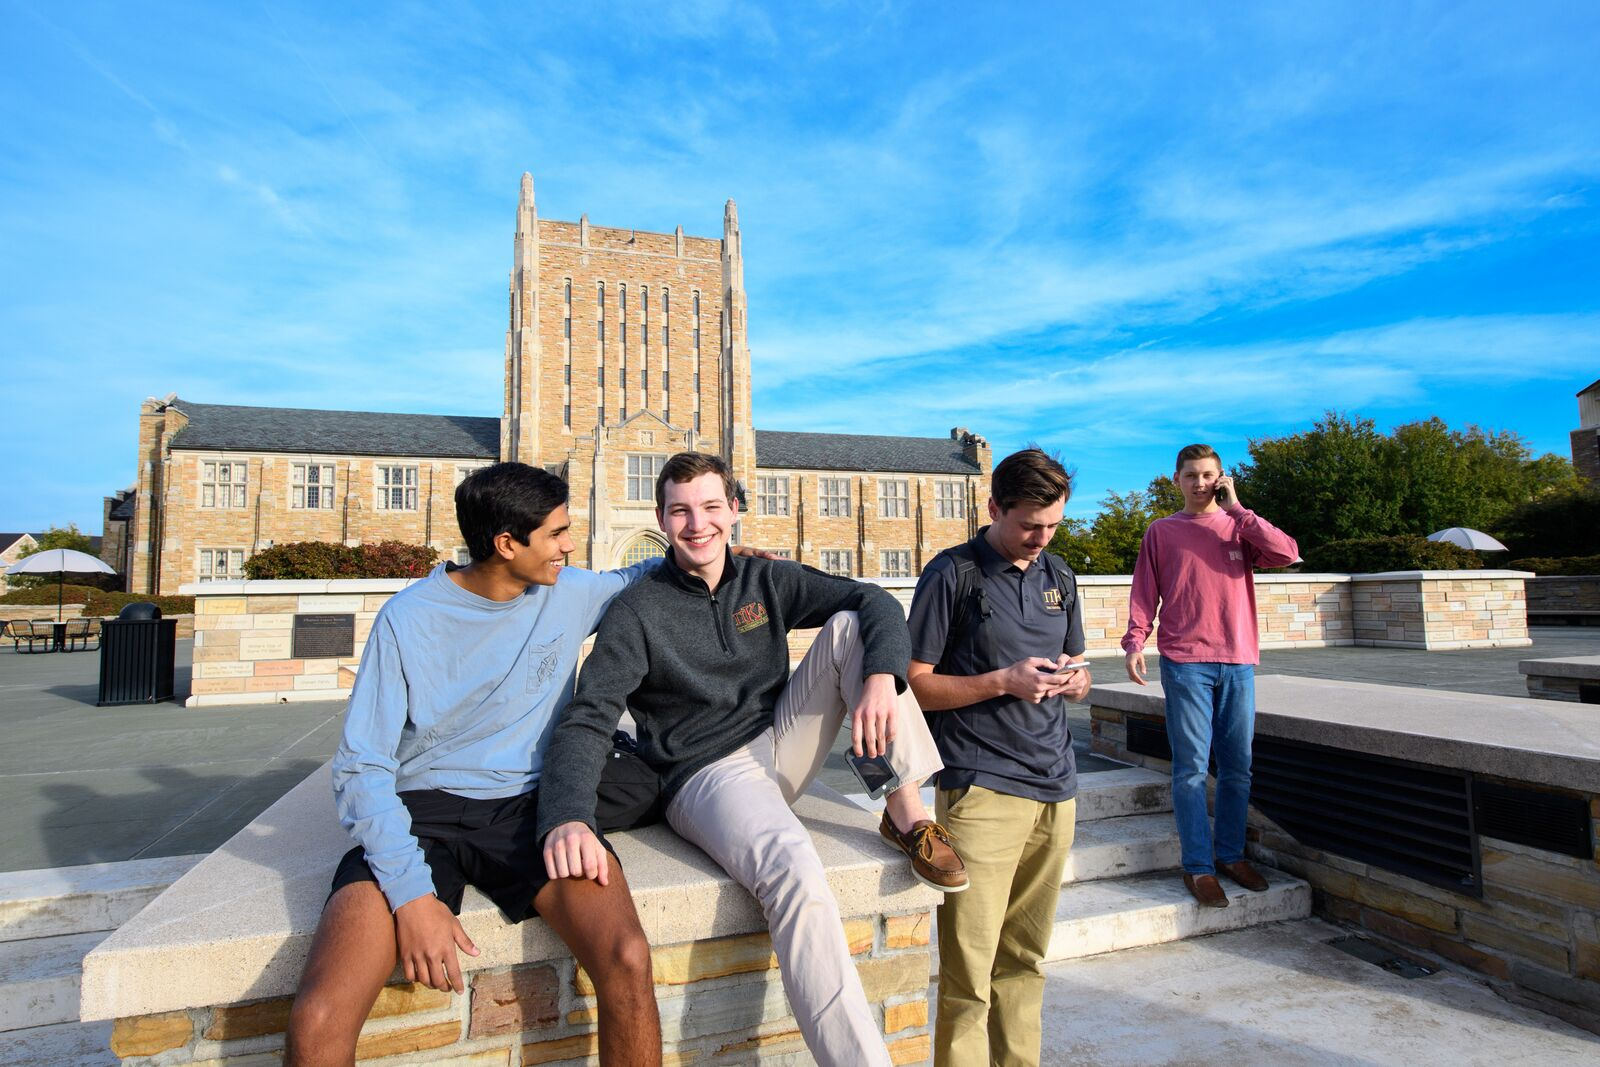 Film Studies – Kendall College Of Arts And Sciences Regarding University Of Tulsa 2021 Calendar